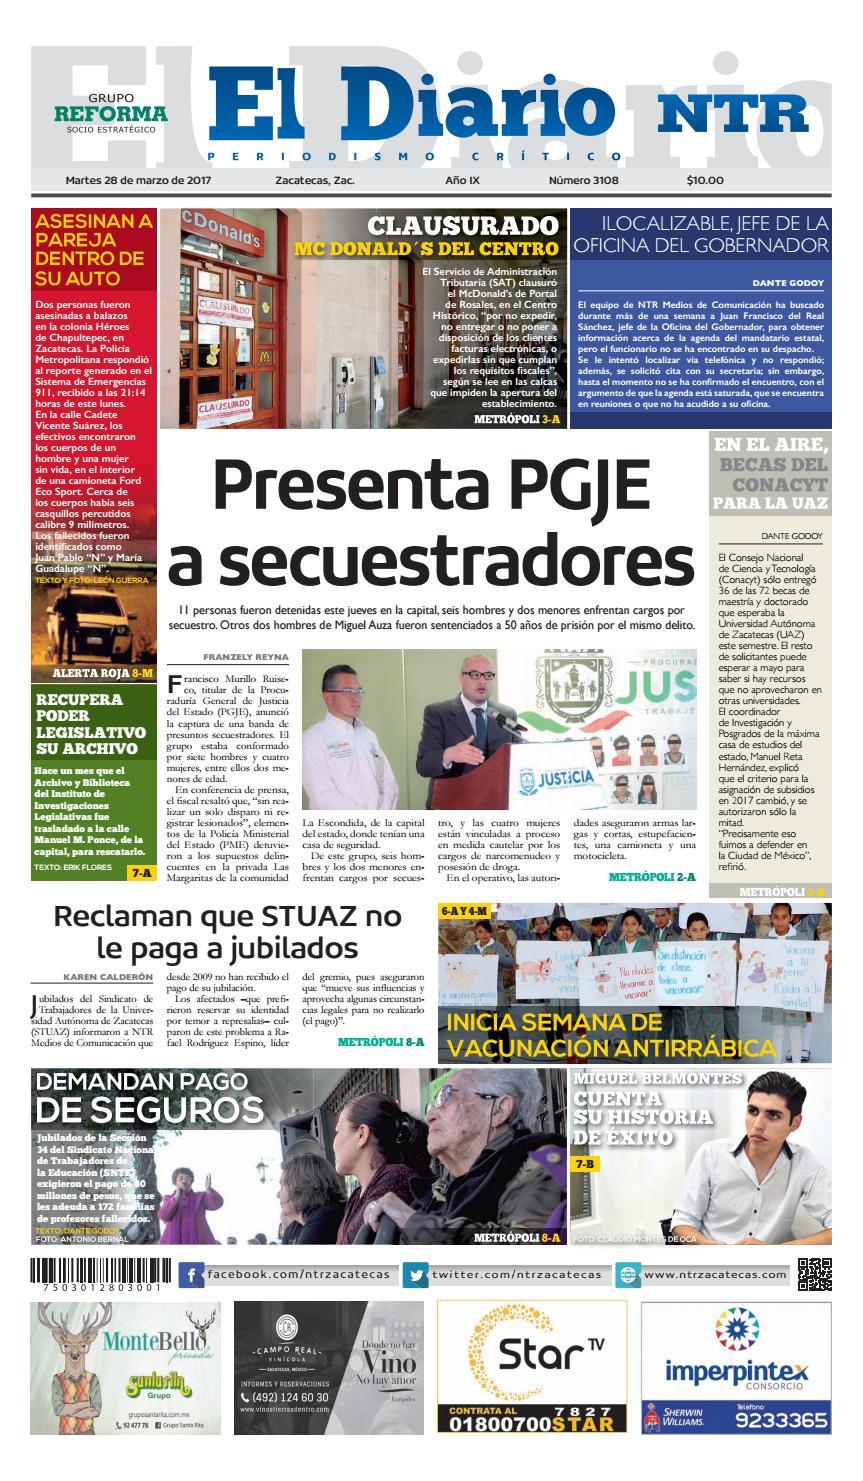 consultar acta de nacimiento gratis tamaulipas pistola beretta cal 40